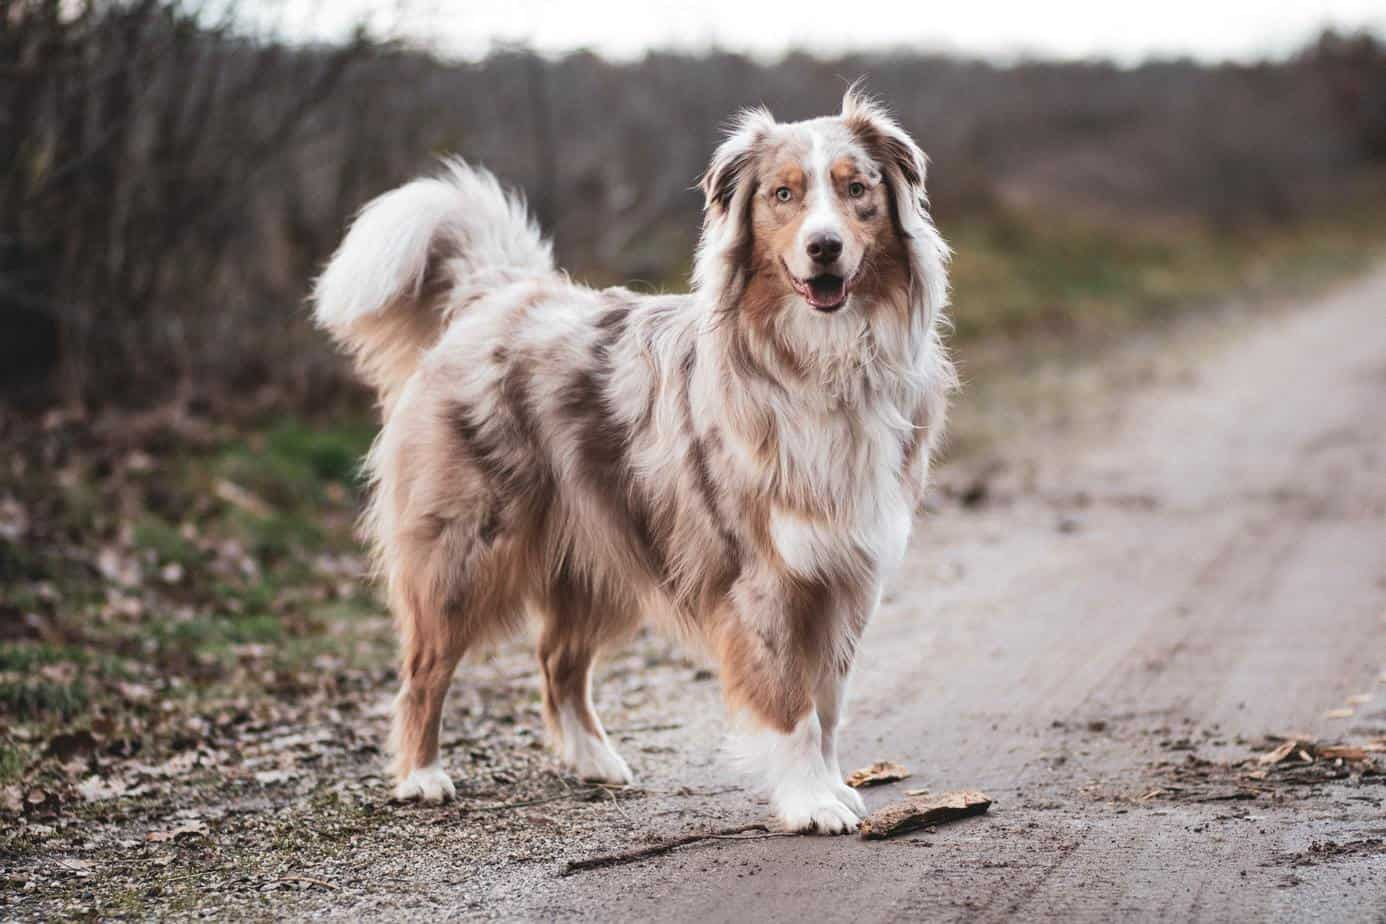 Appearance of Australian shepherd dog